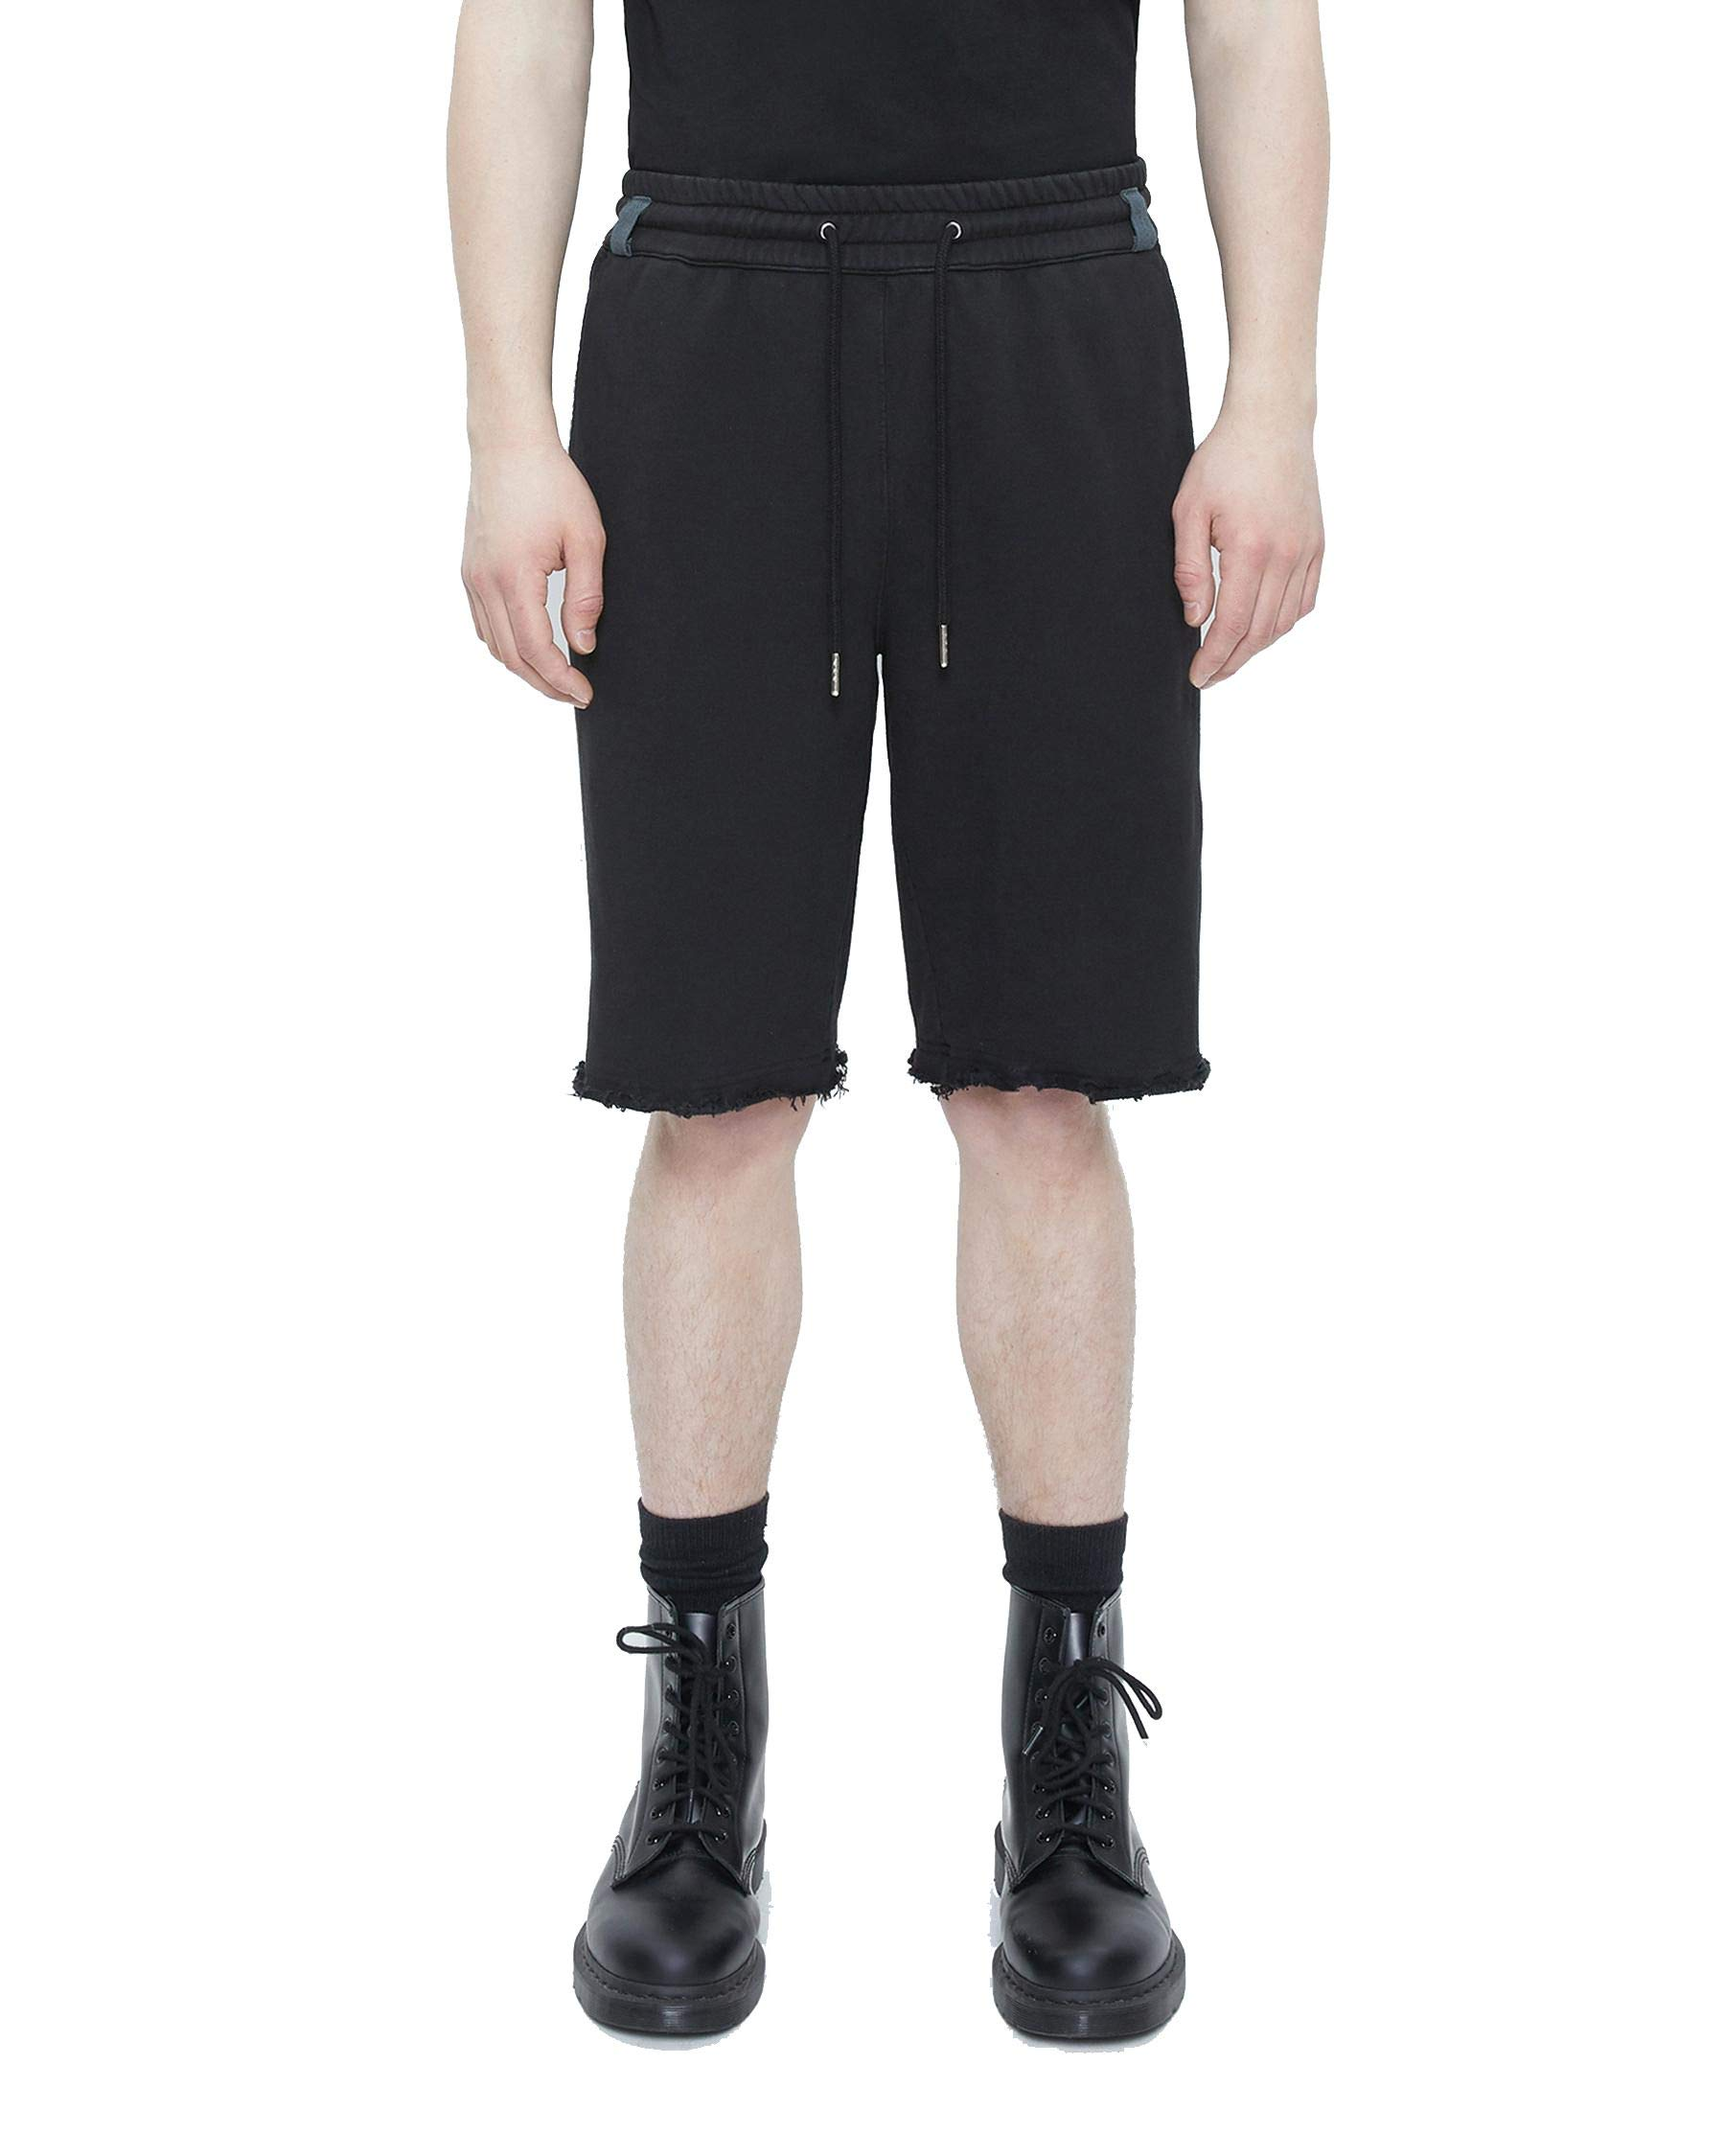 Helmut Lang Men's I05hm212001 Black Cotton Shorts